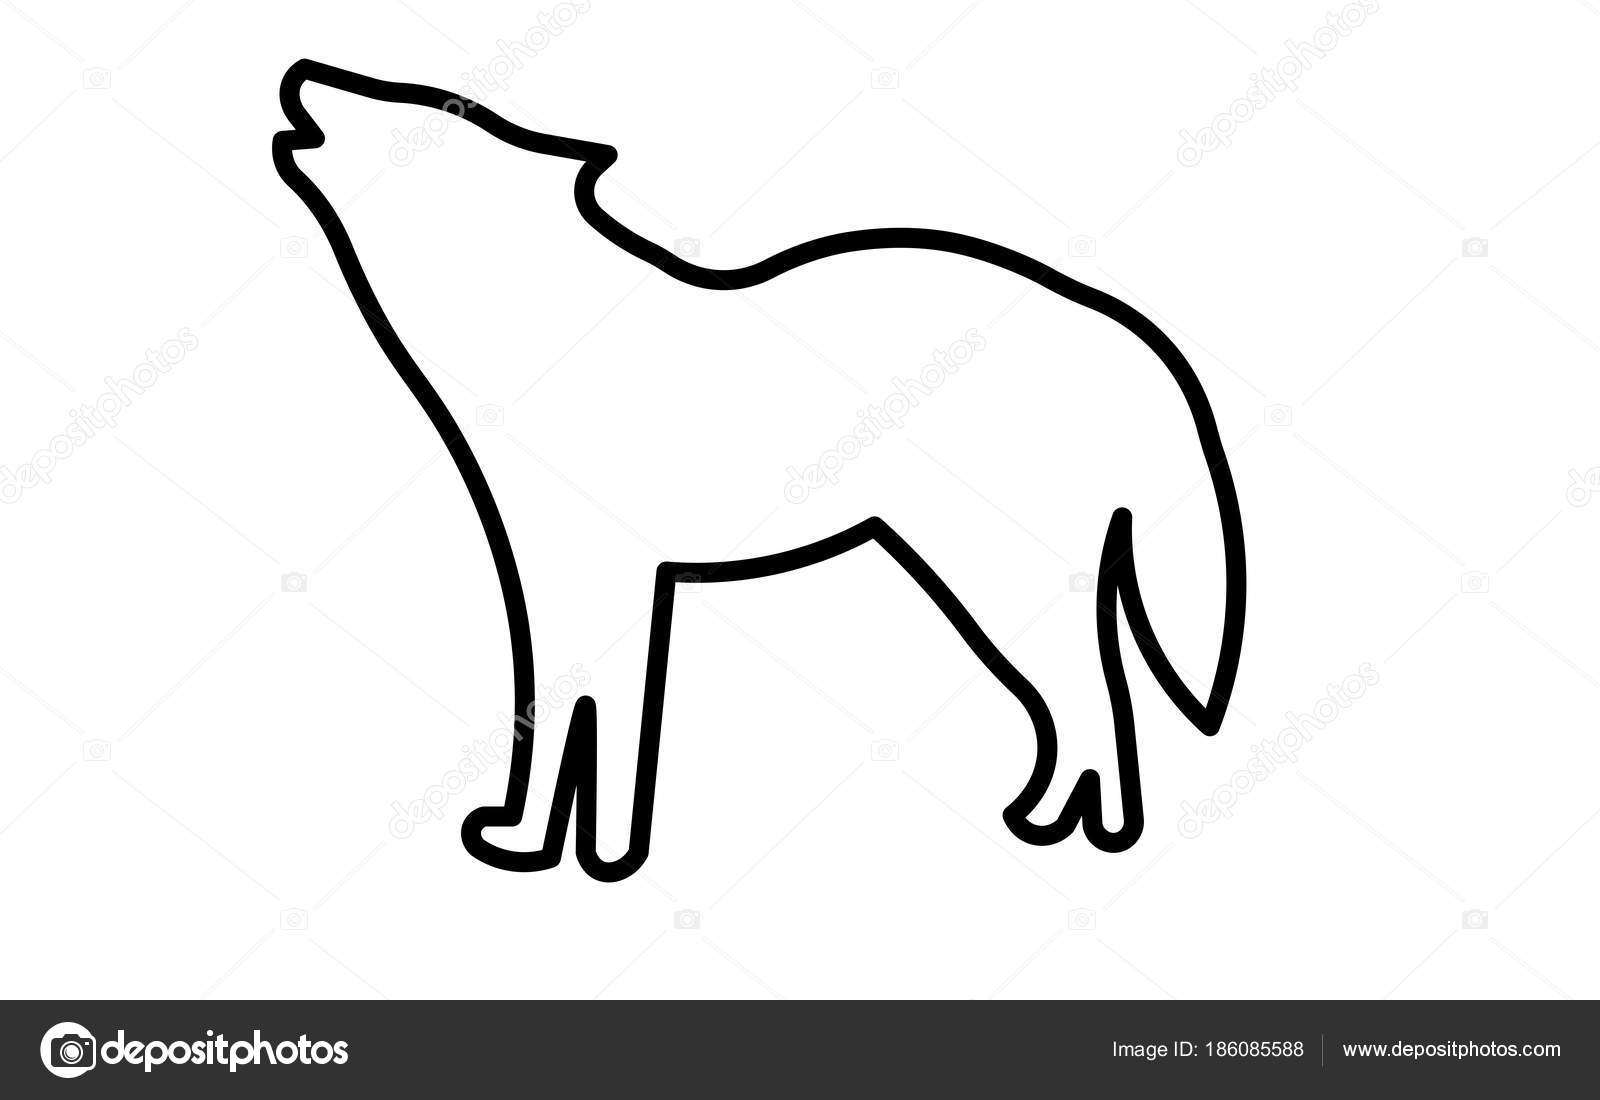 uivos de lobo silhueta clip art estrutura de tópicos no fundo branco